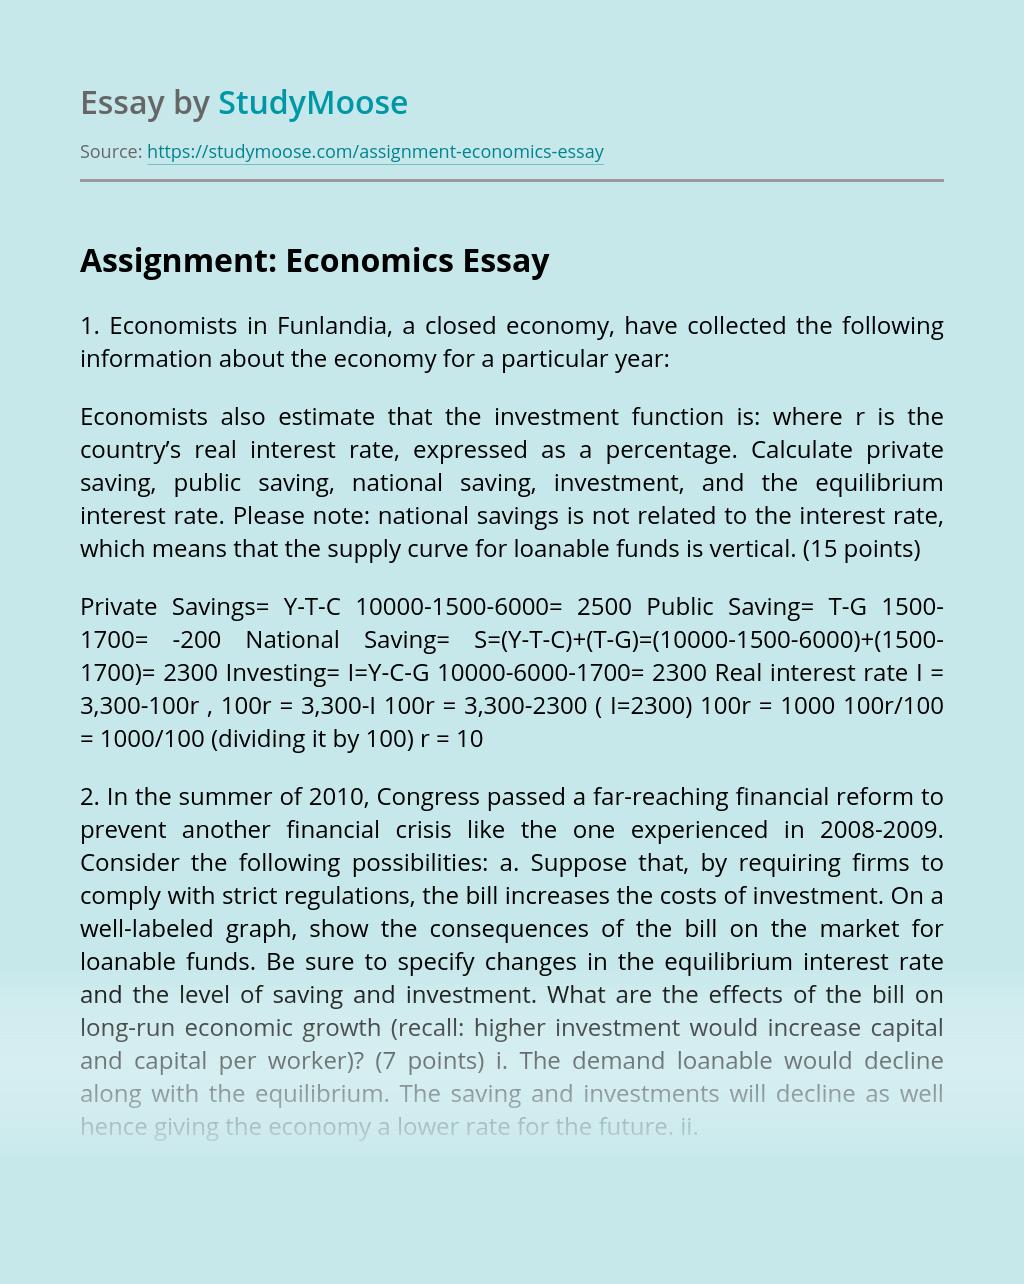 Assignment: Economics